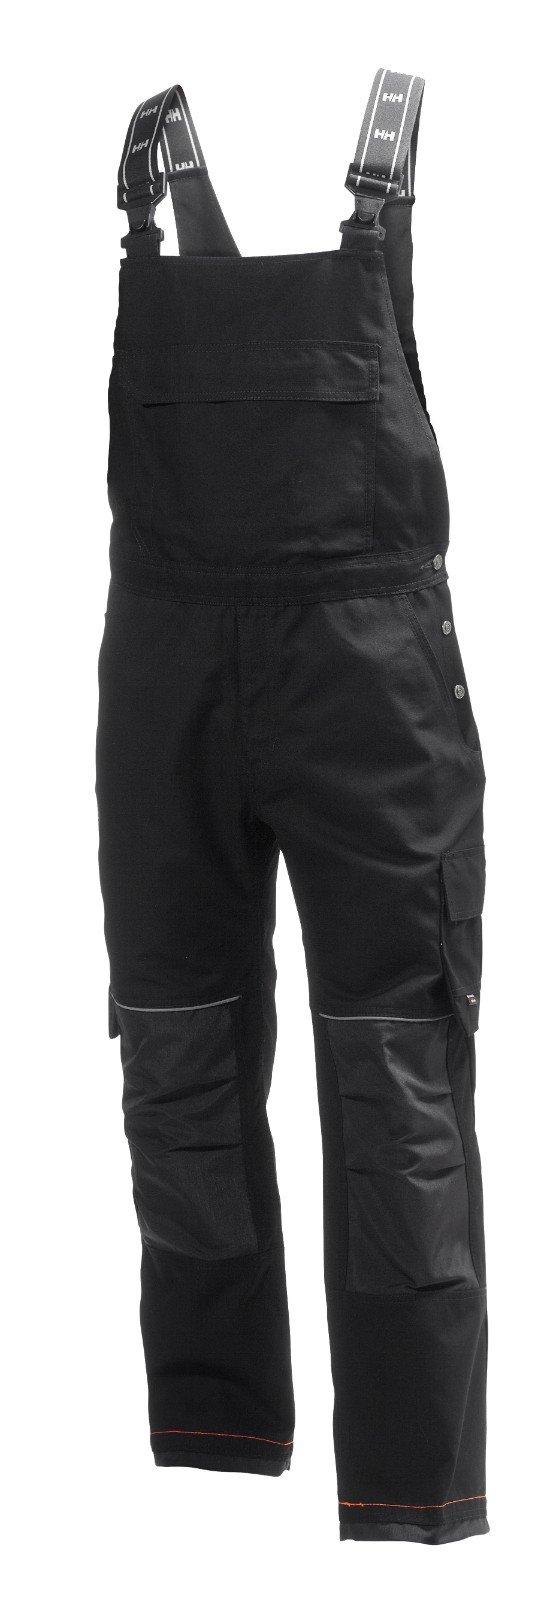 Helly Hansen Work Wear Men's Chelsea Construction Work Bib Pants, Black/Charcoal, 46Wx32L